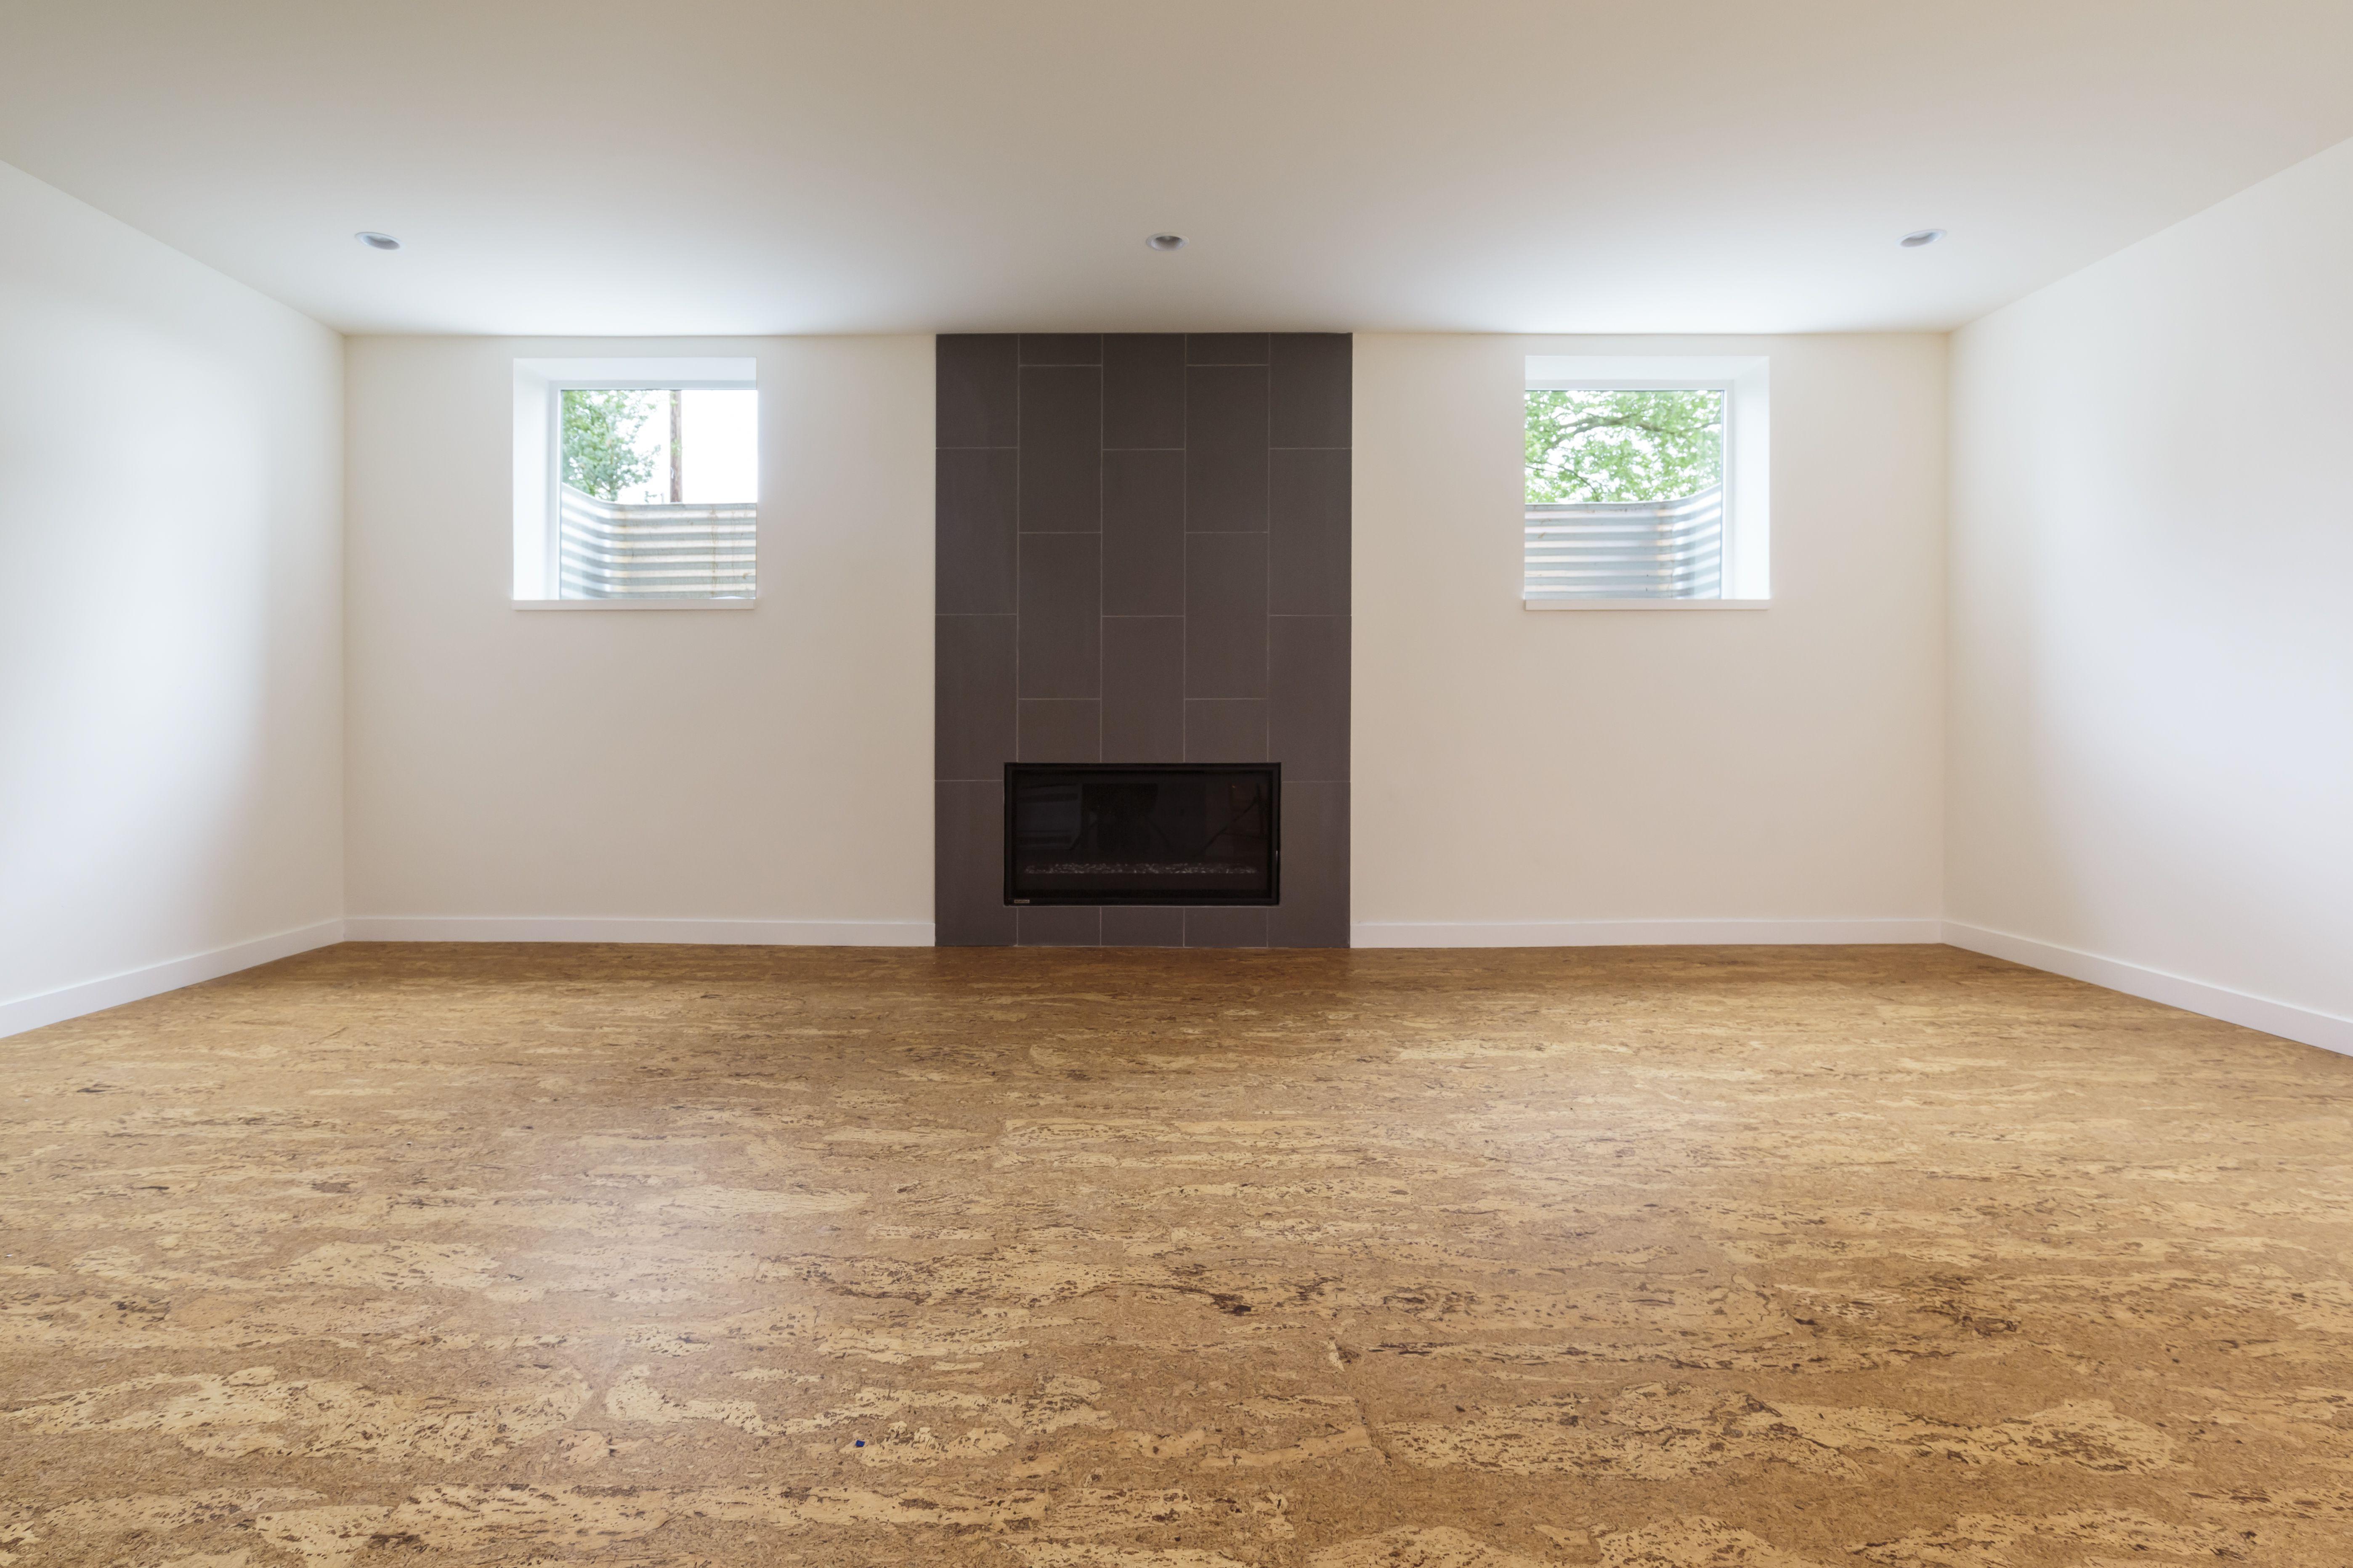 hardwood flooring options pros cons of cork flooring pros cons and cost for cork flooring in unfurnished new home 647206431 57e7c0c95f9b586c3504ca07